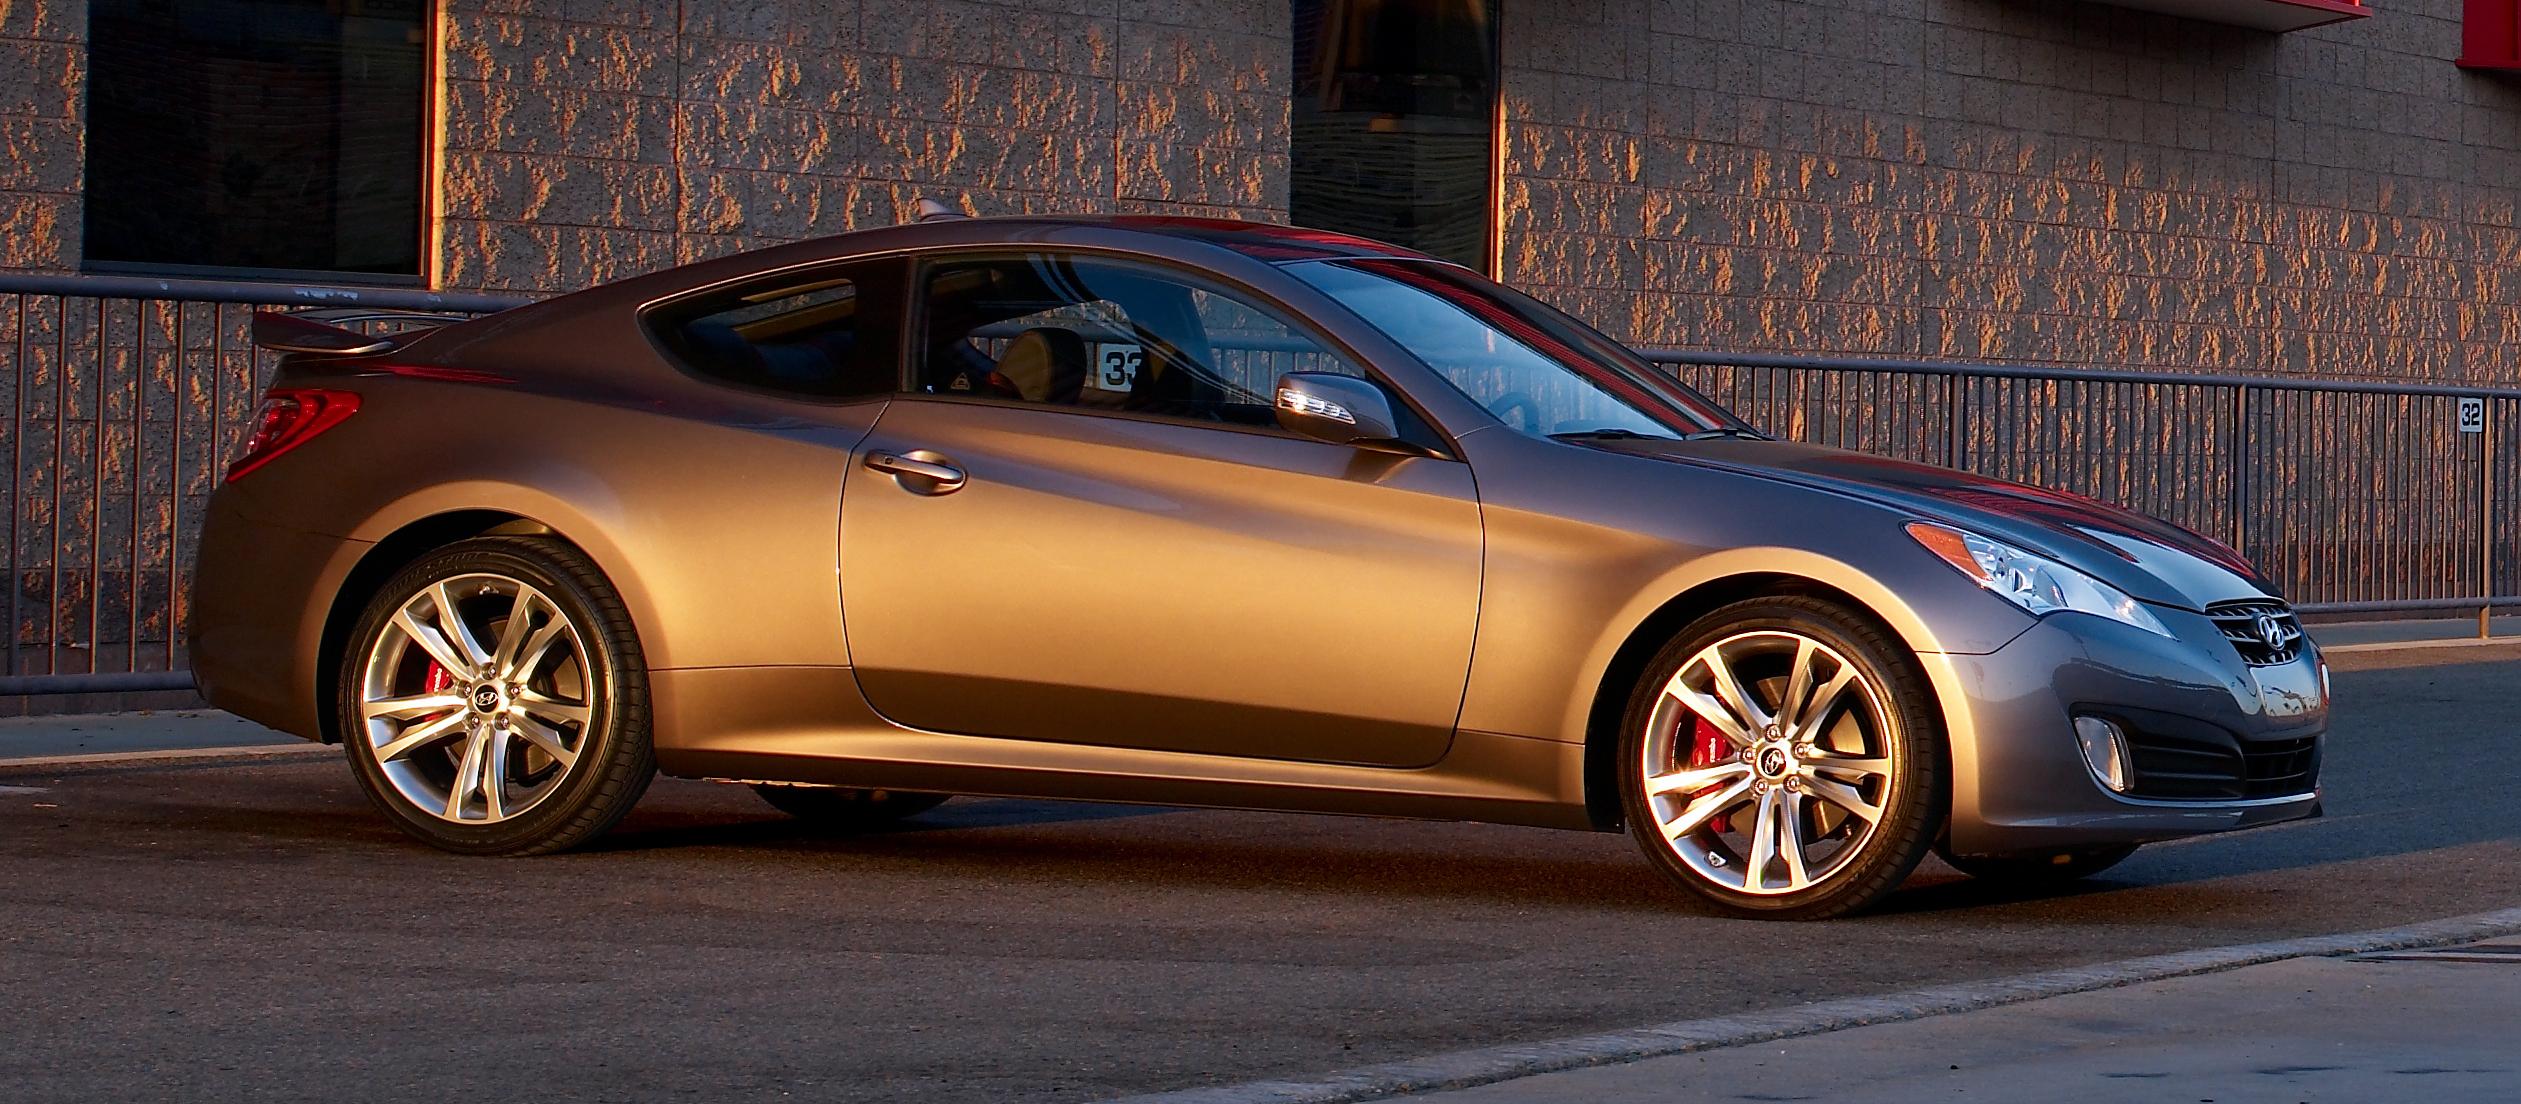 2010 hyundai genesis coupe 3 8 track review autosavant autosavant - Asset_upload_file1_2970